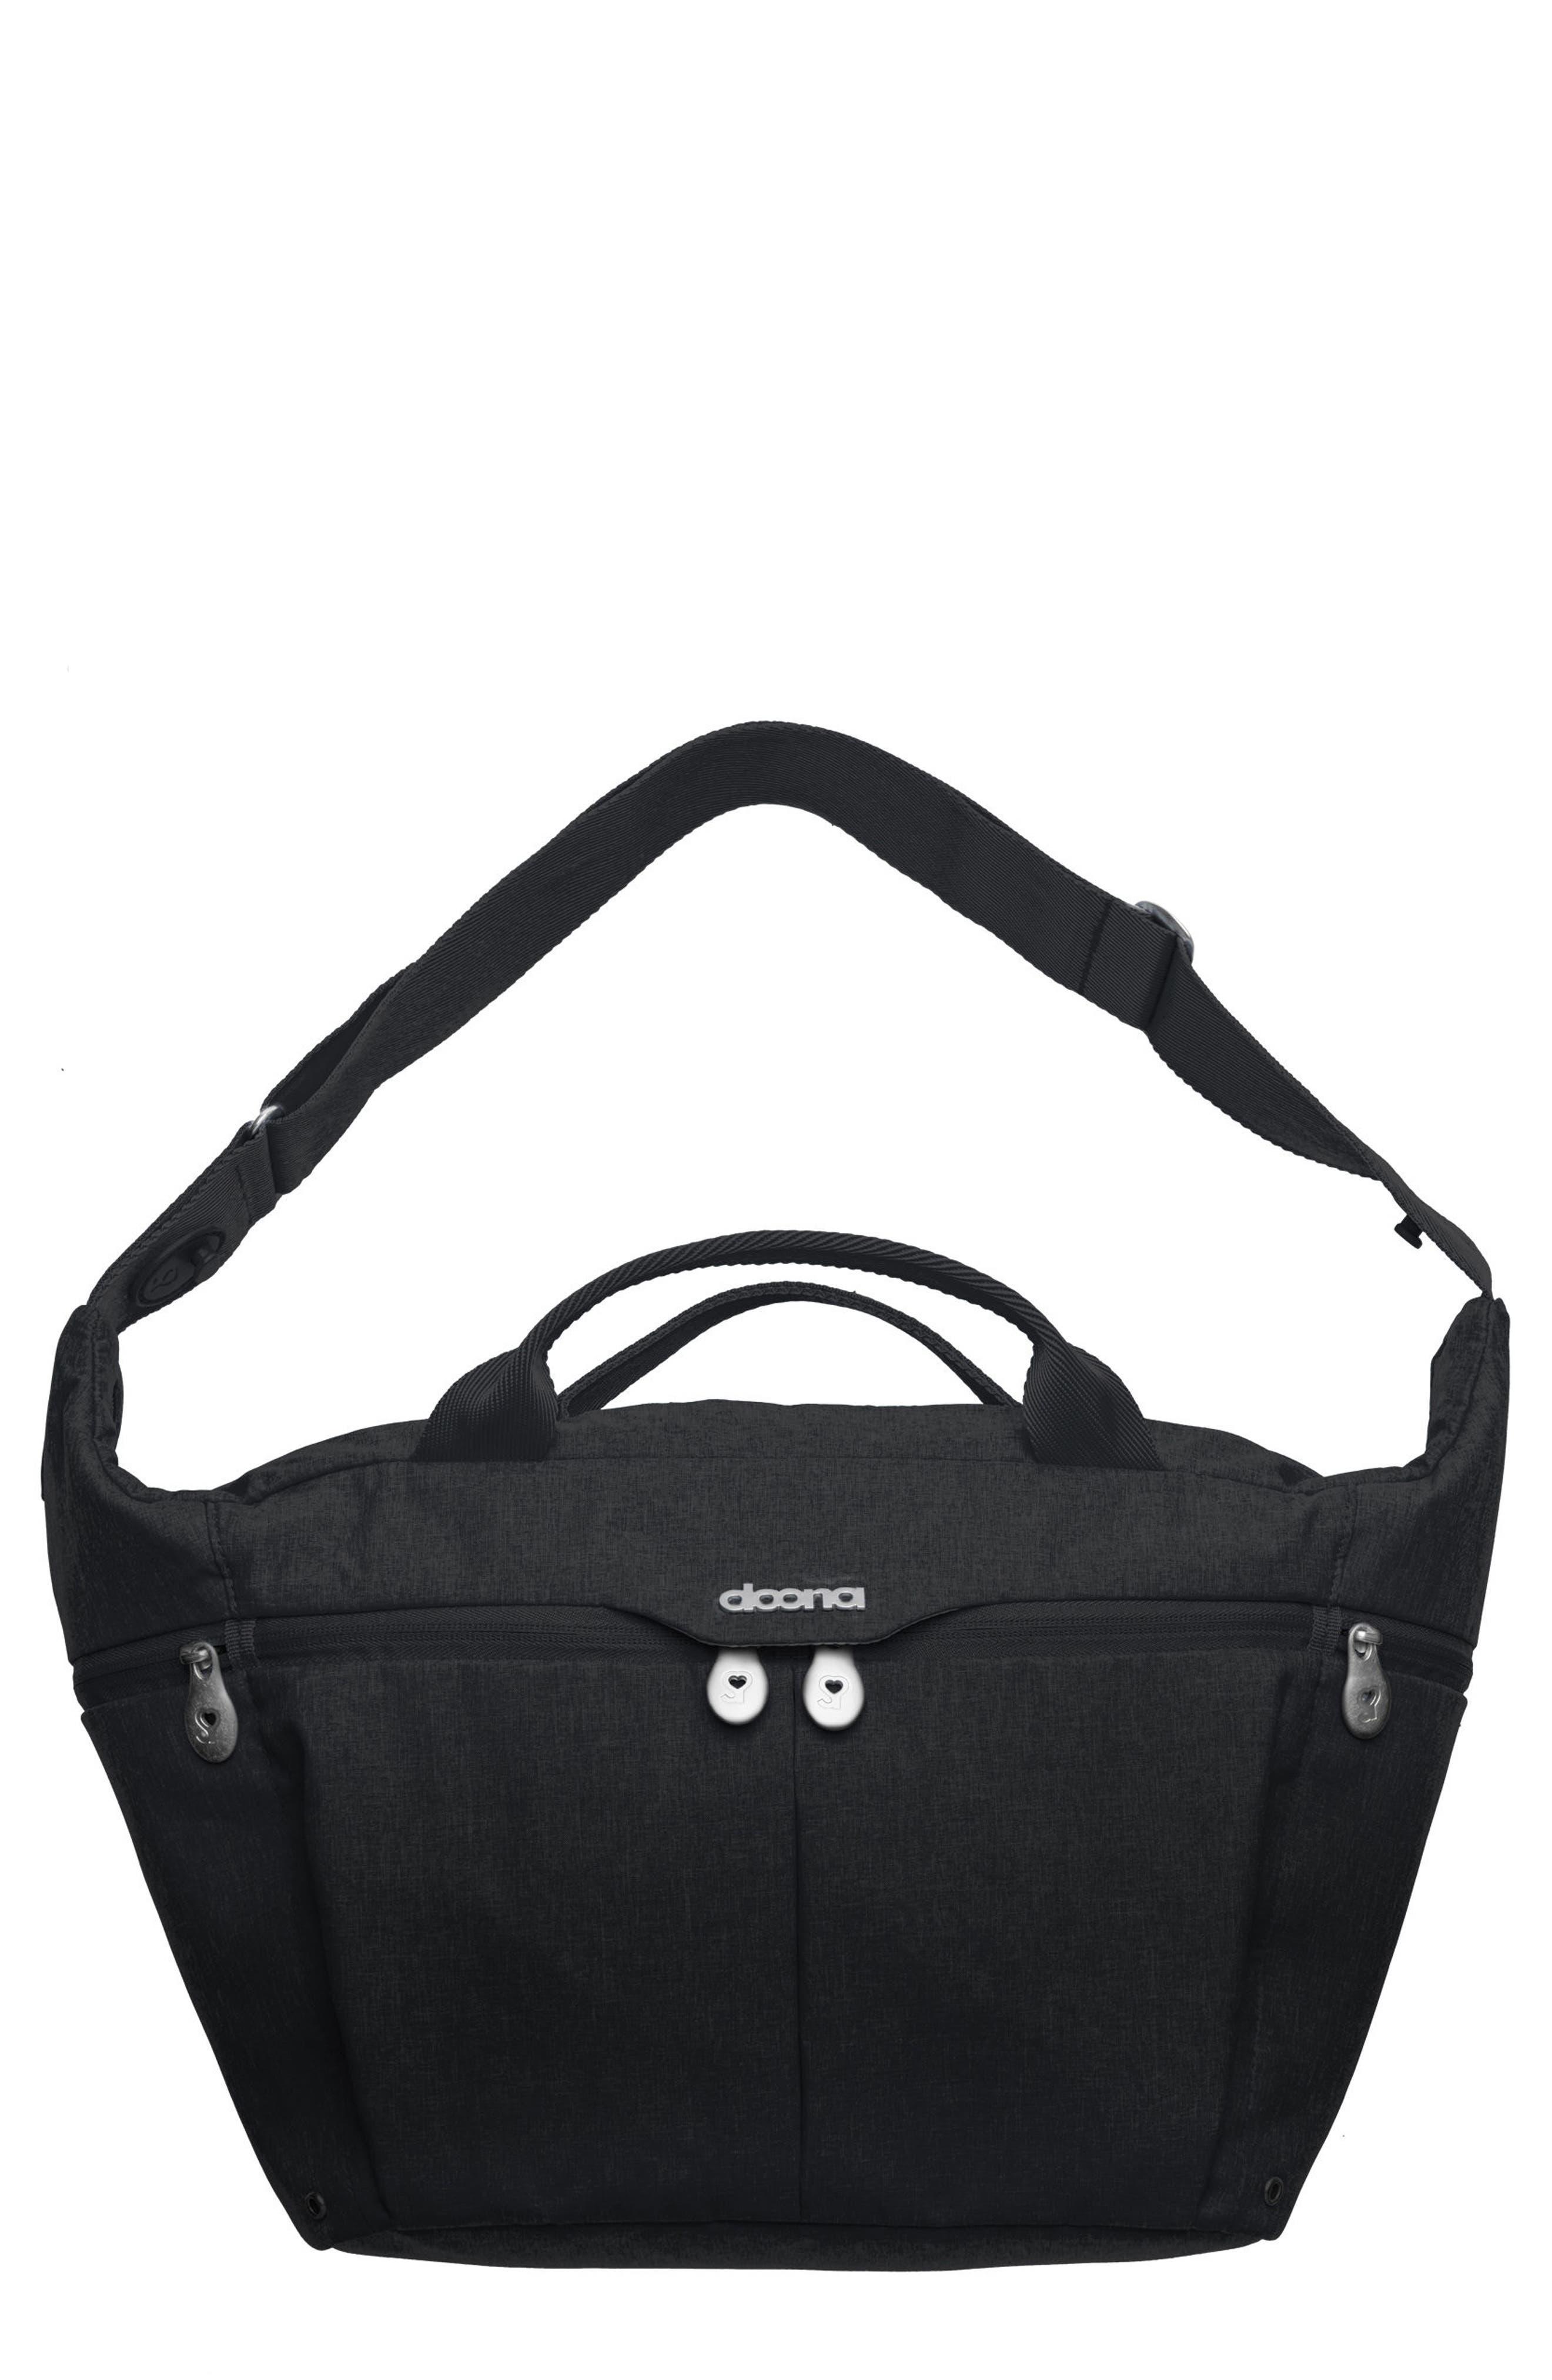 All-Day Diaper Bag,                             Main thumbnail 1, color,                             Black